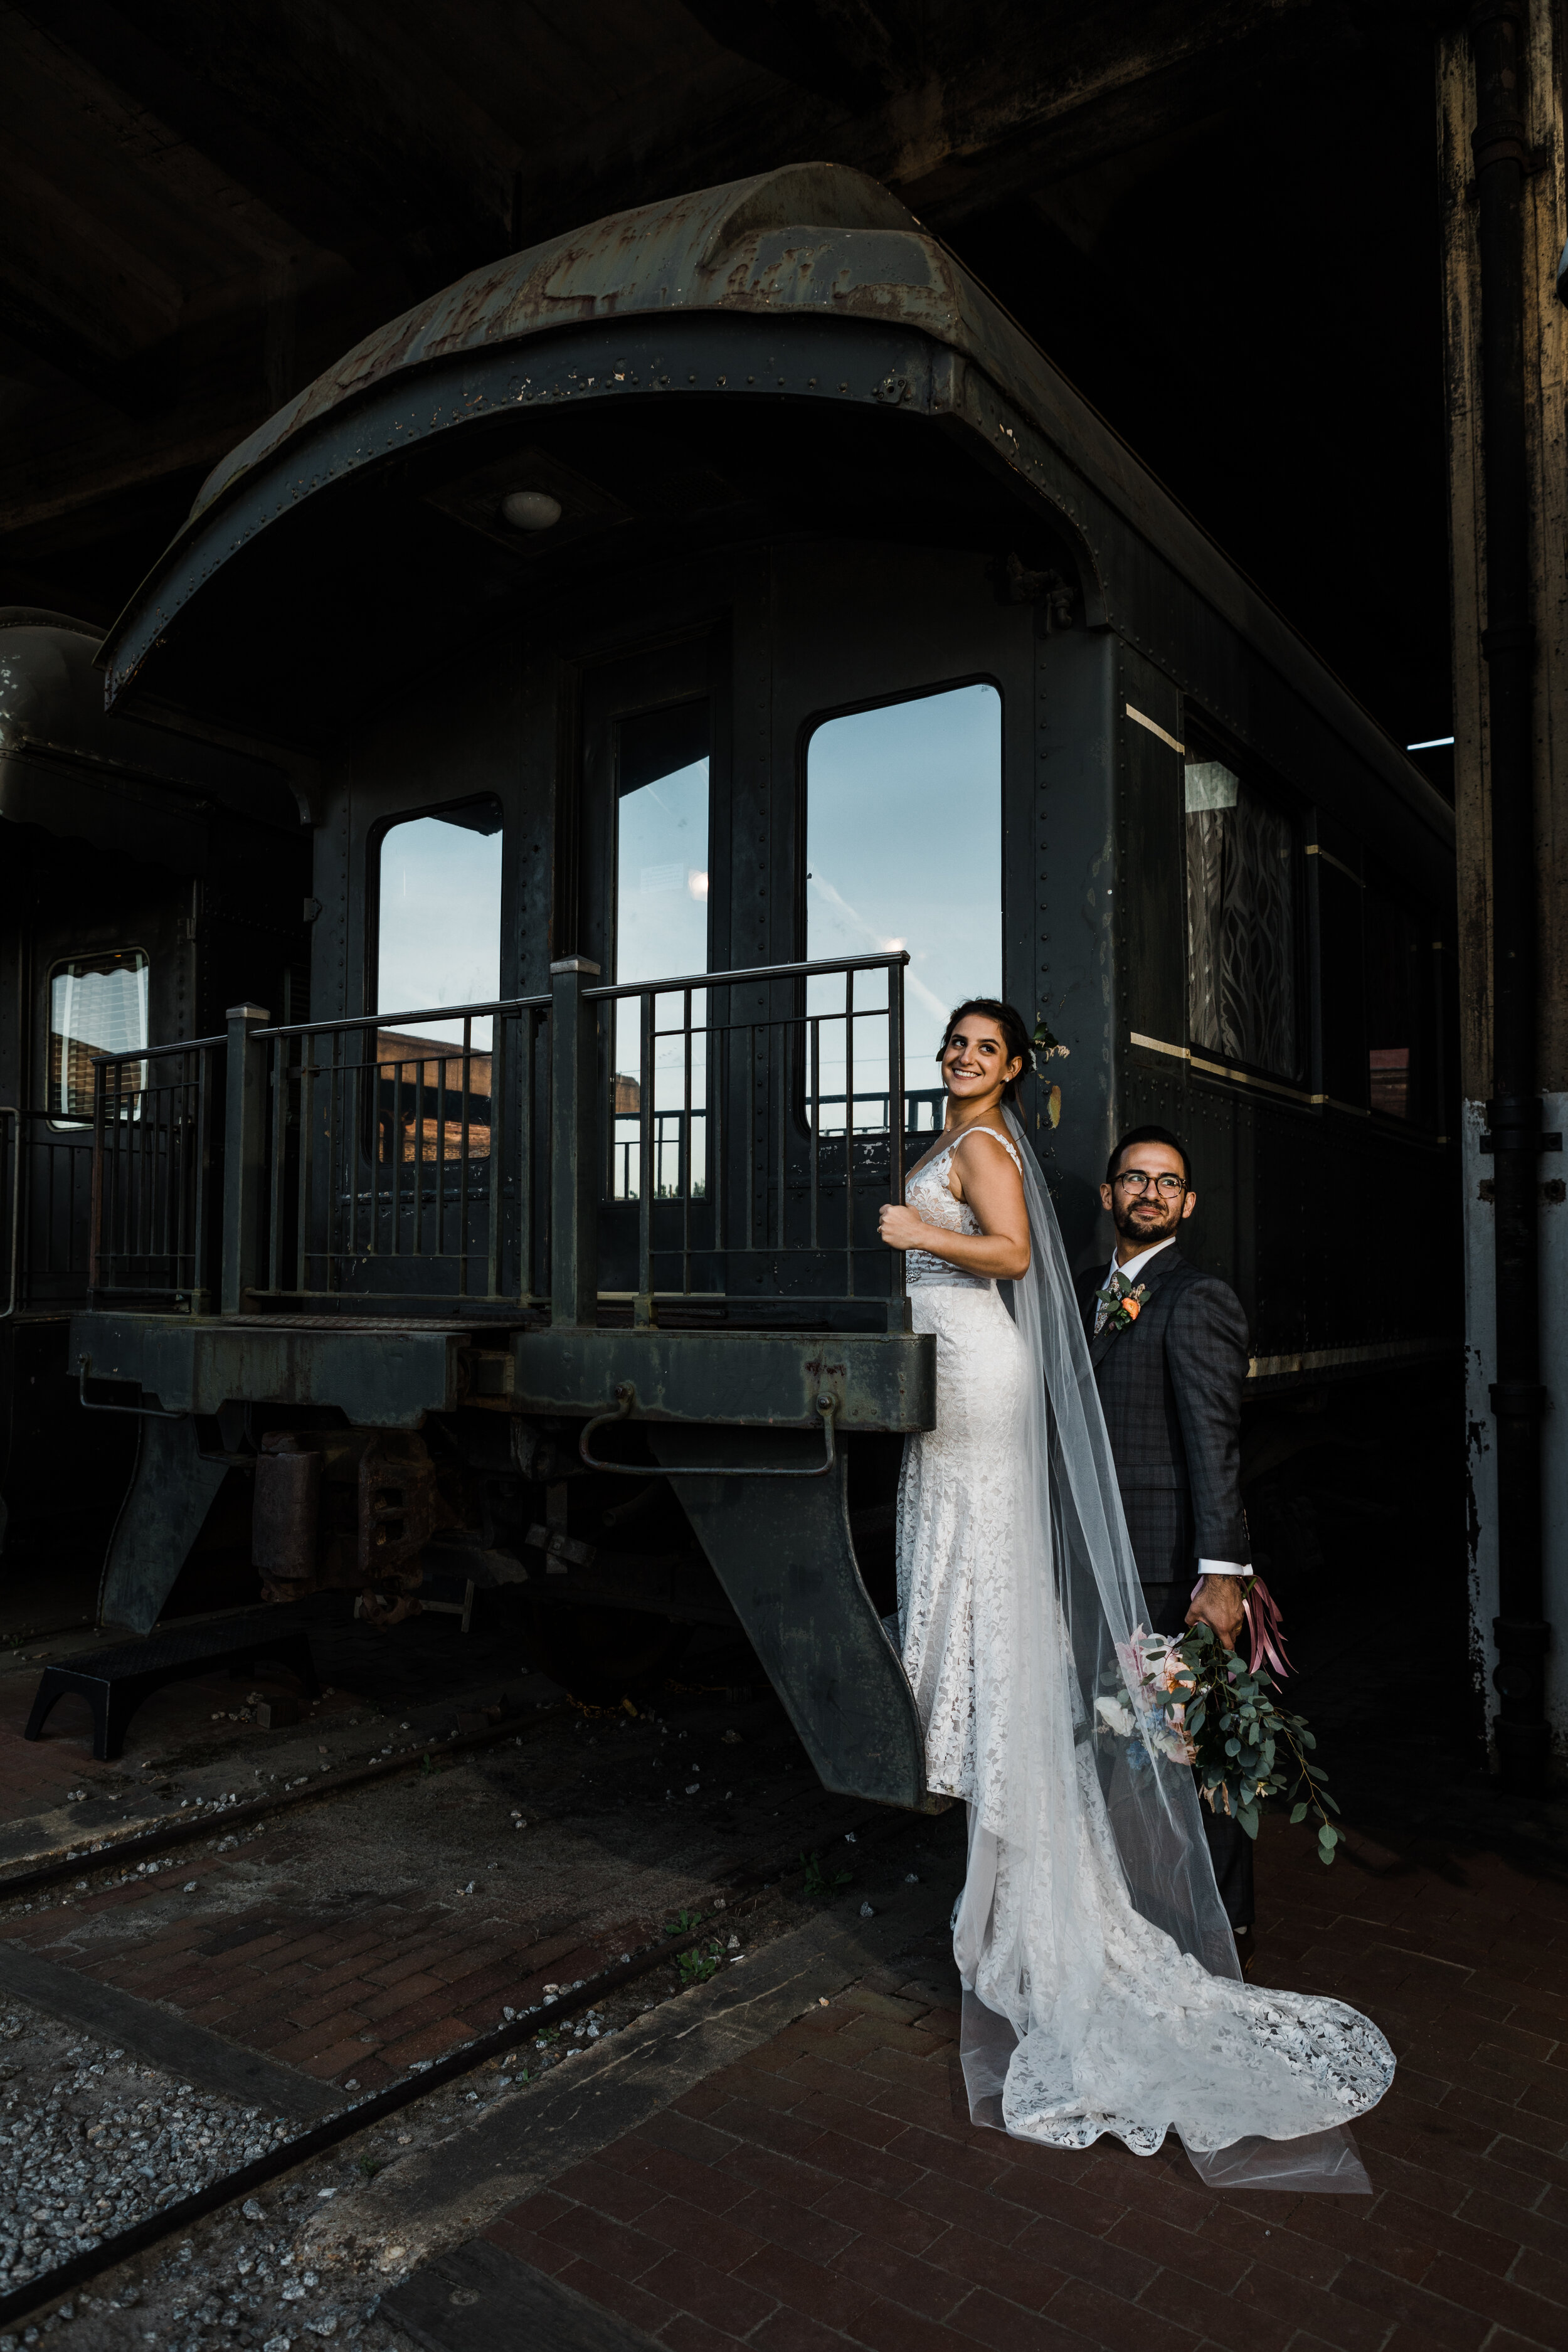 ivory-and-beau-blog-weddings-ivory-and-beau-couple-dominique-and-andres-savannah-florist-wedding-planning-savannah-bridal-boutique-wedding-flowers-KIP_WEBERWEDDING_RAILROADMUSEUM-1335.JPG